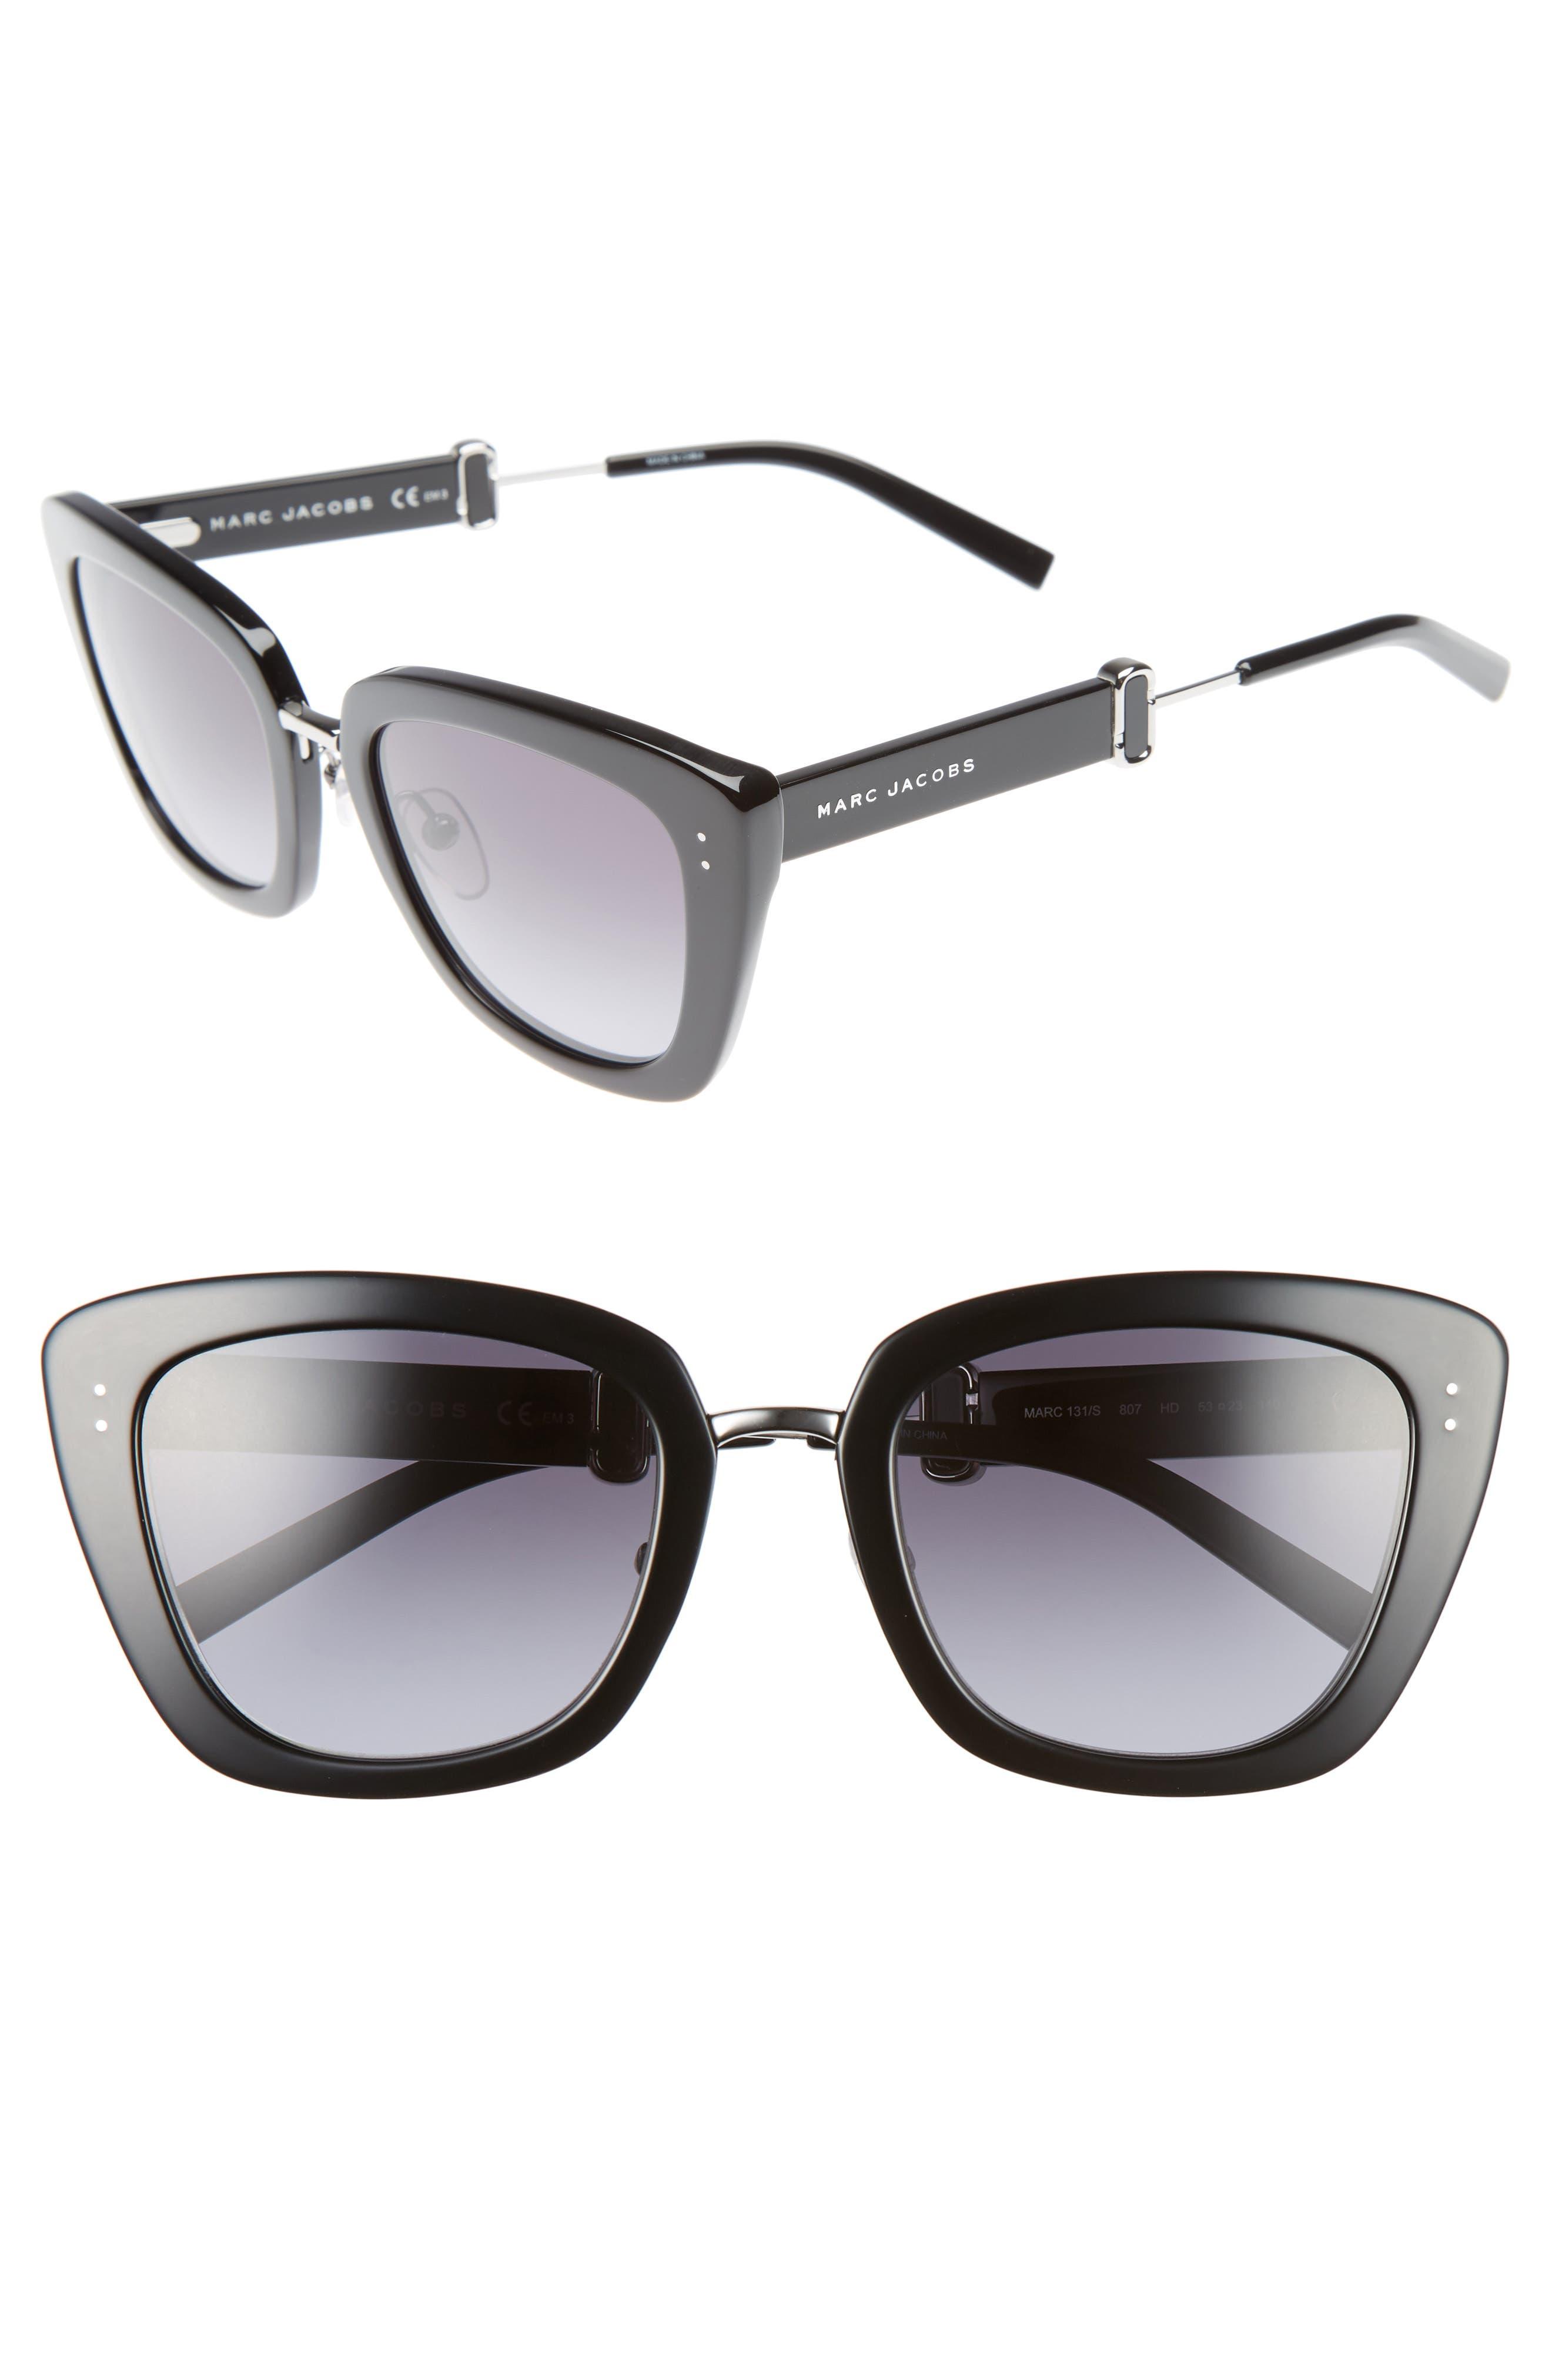 Main Image - MARC JACOBS 53mm Oversized Sunglasses